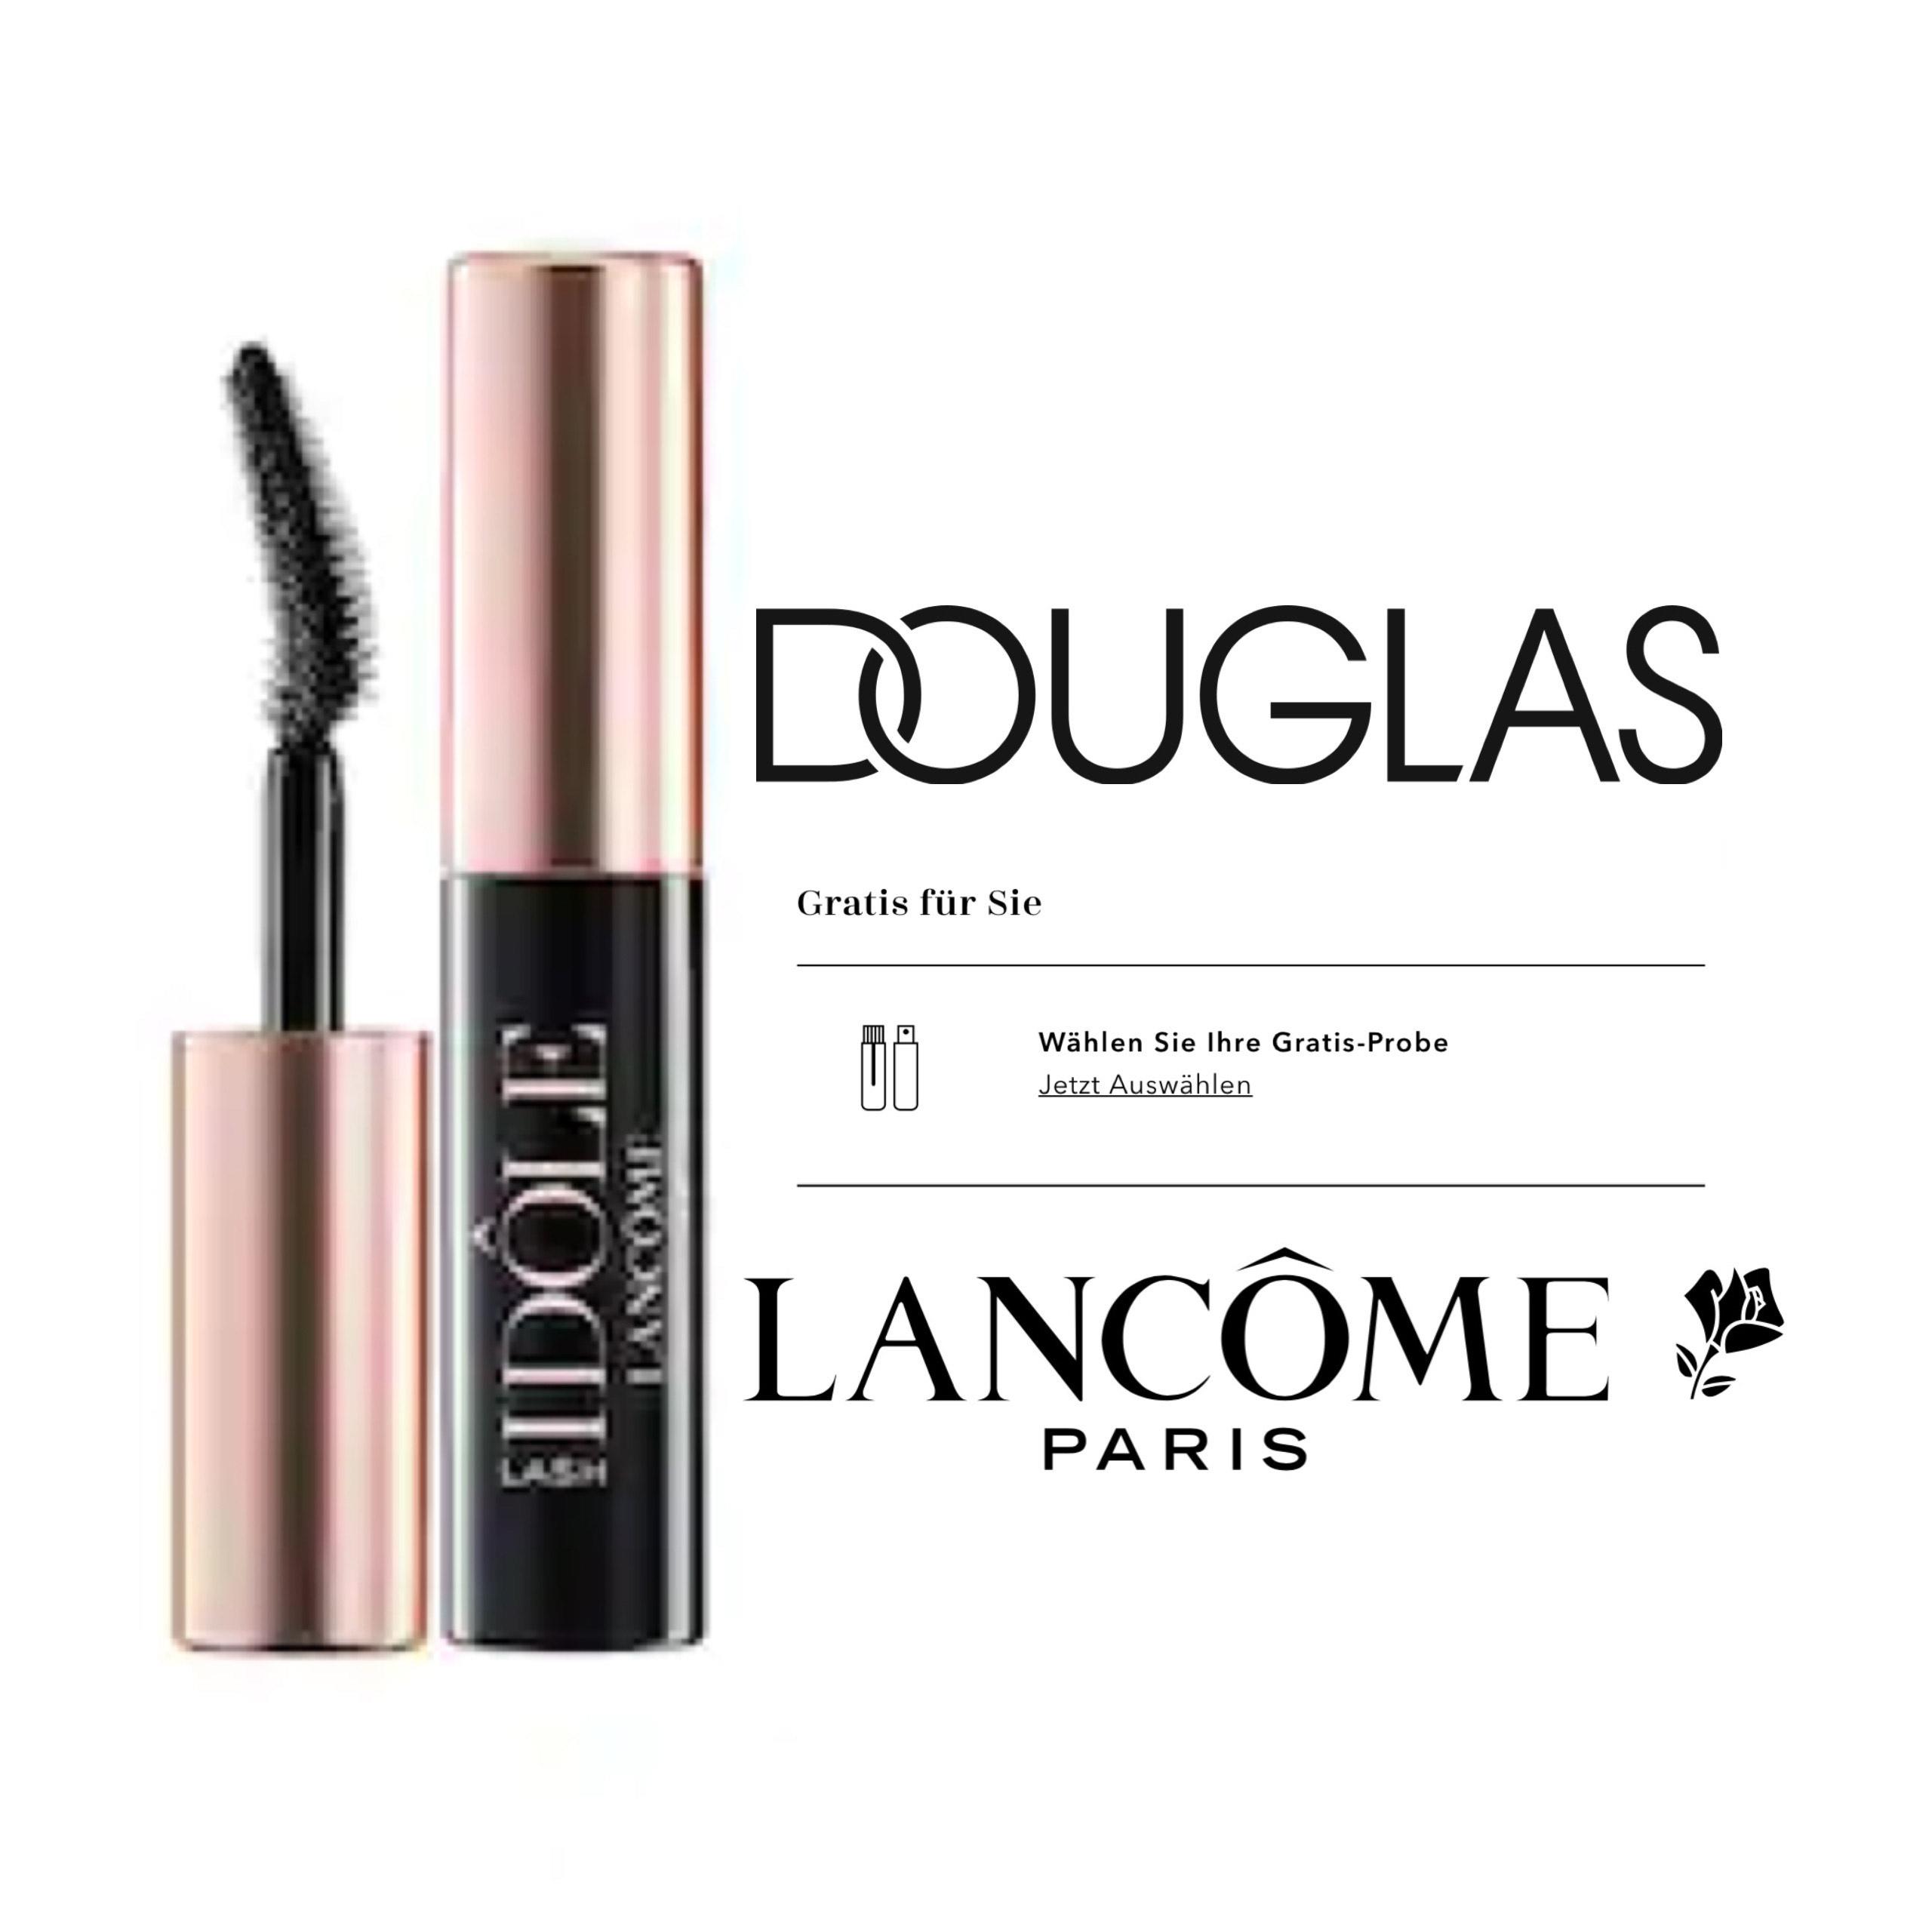 [ Douglas ] Lancôme Lash Idôle Mascara Miniatur für 0,30€ + Gratis Versand*